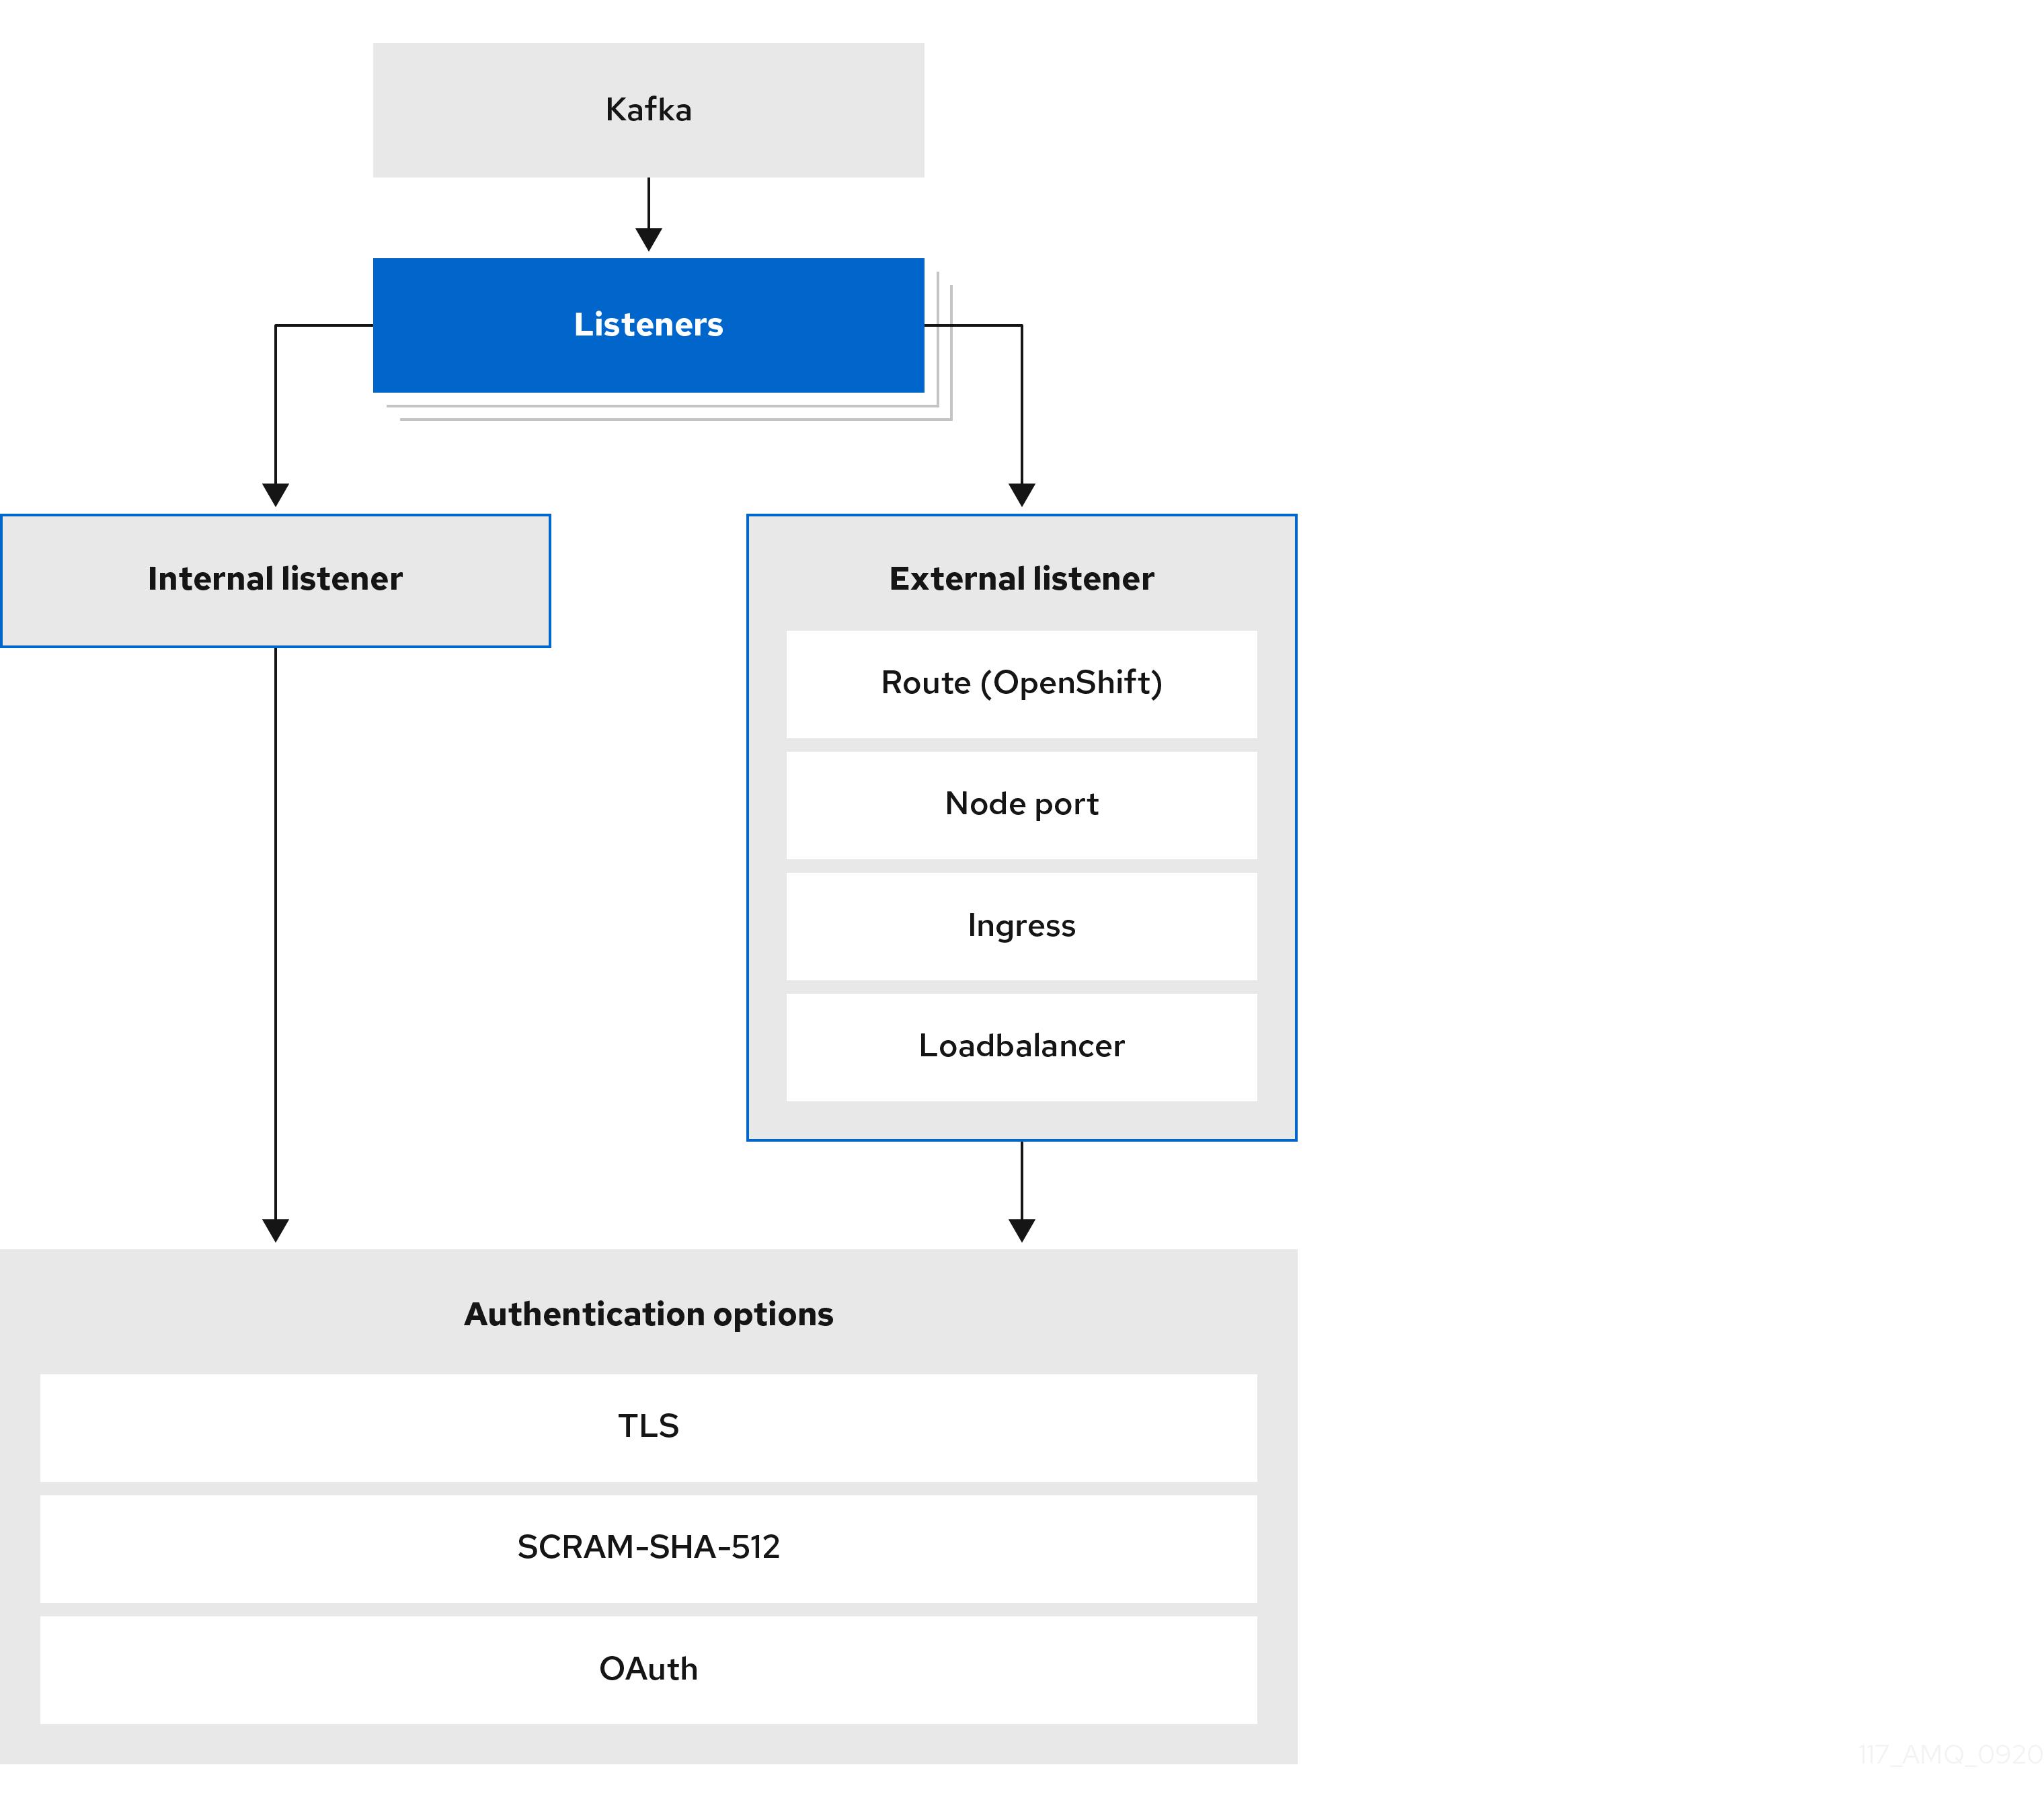 options for listener authentication configuration